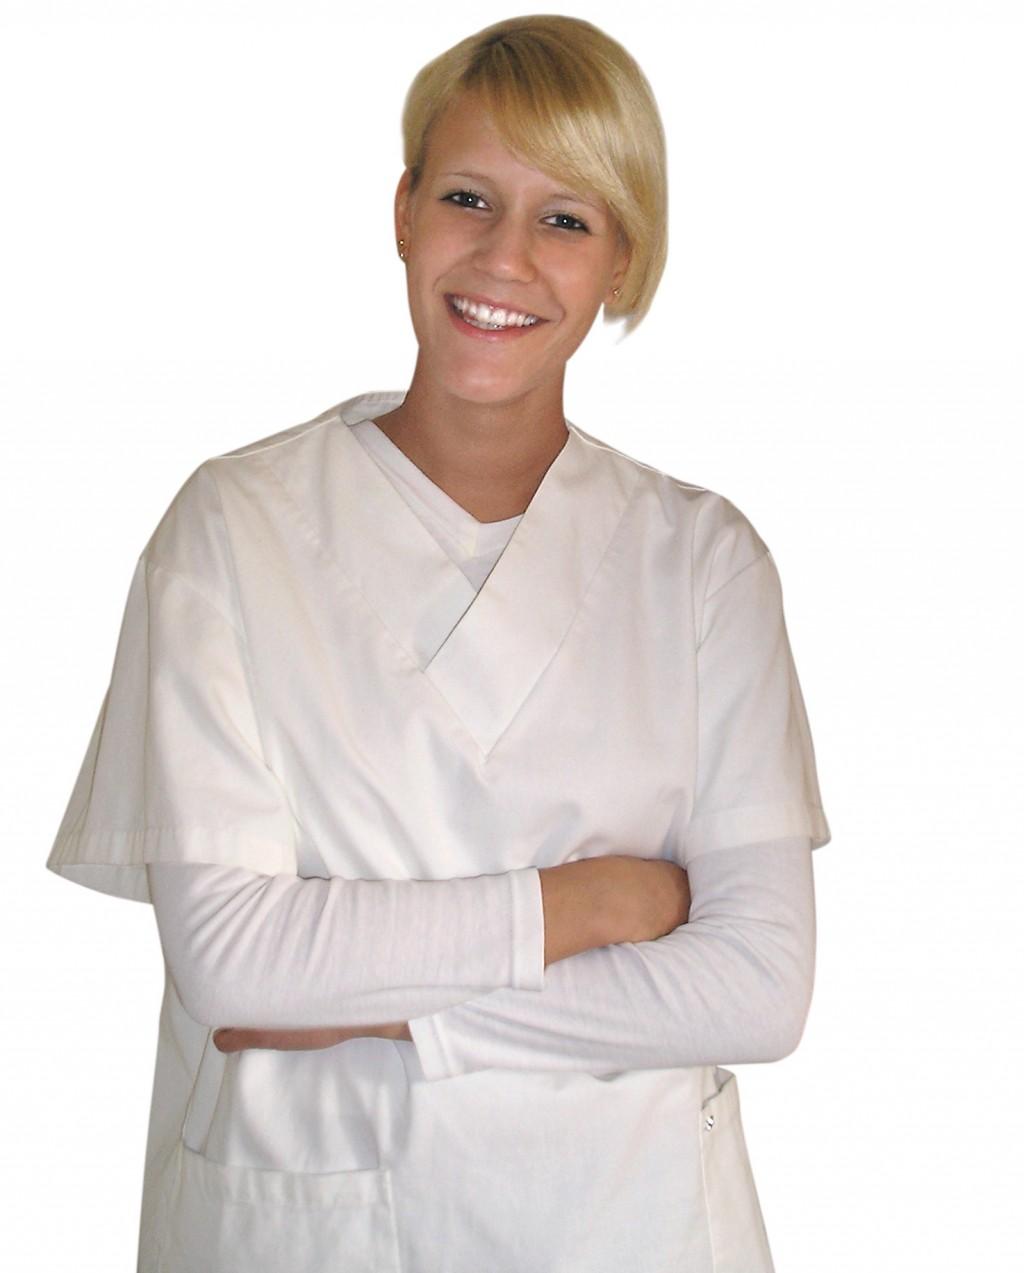 Essay on pursuing a nursing career